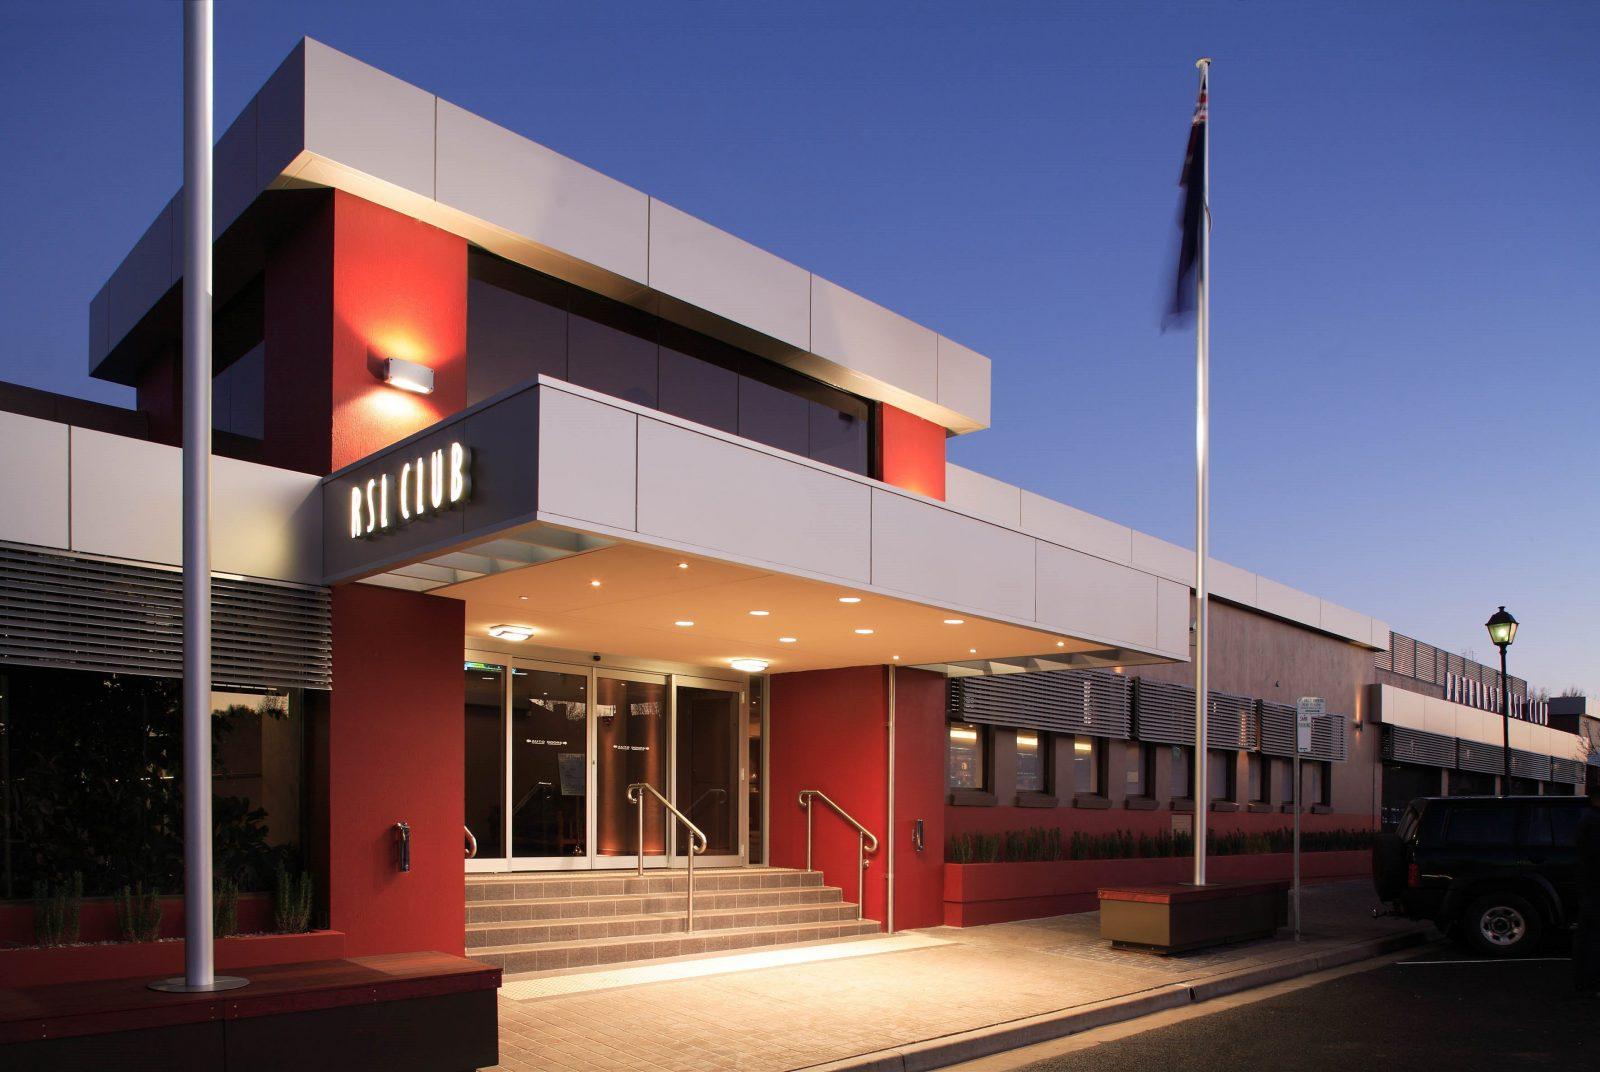 Bathrust RSL Club exterior